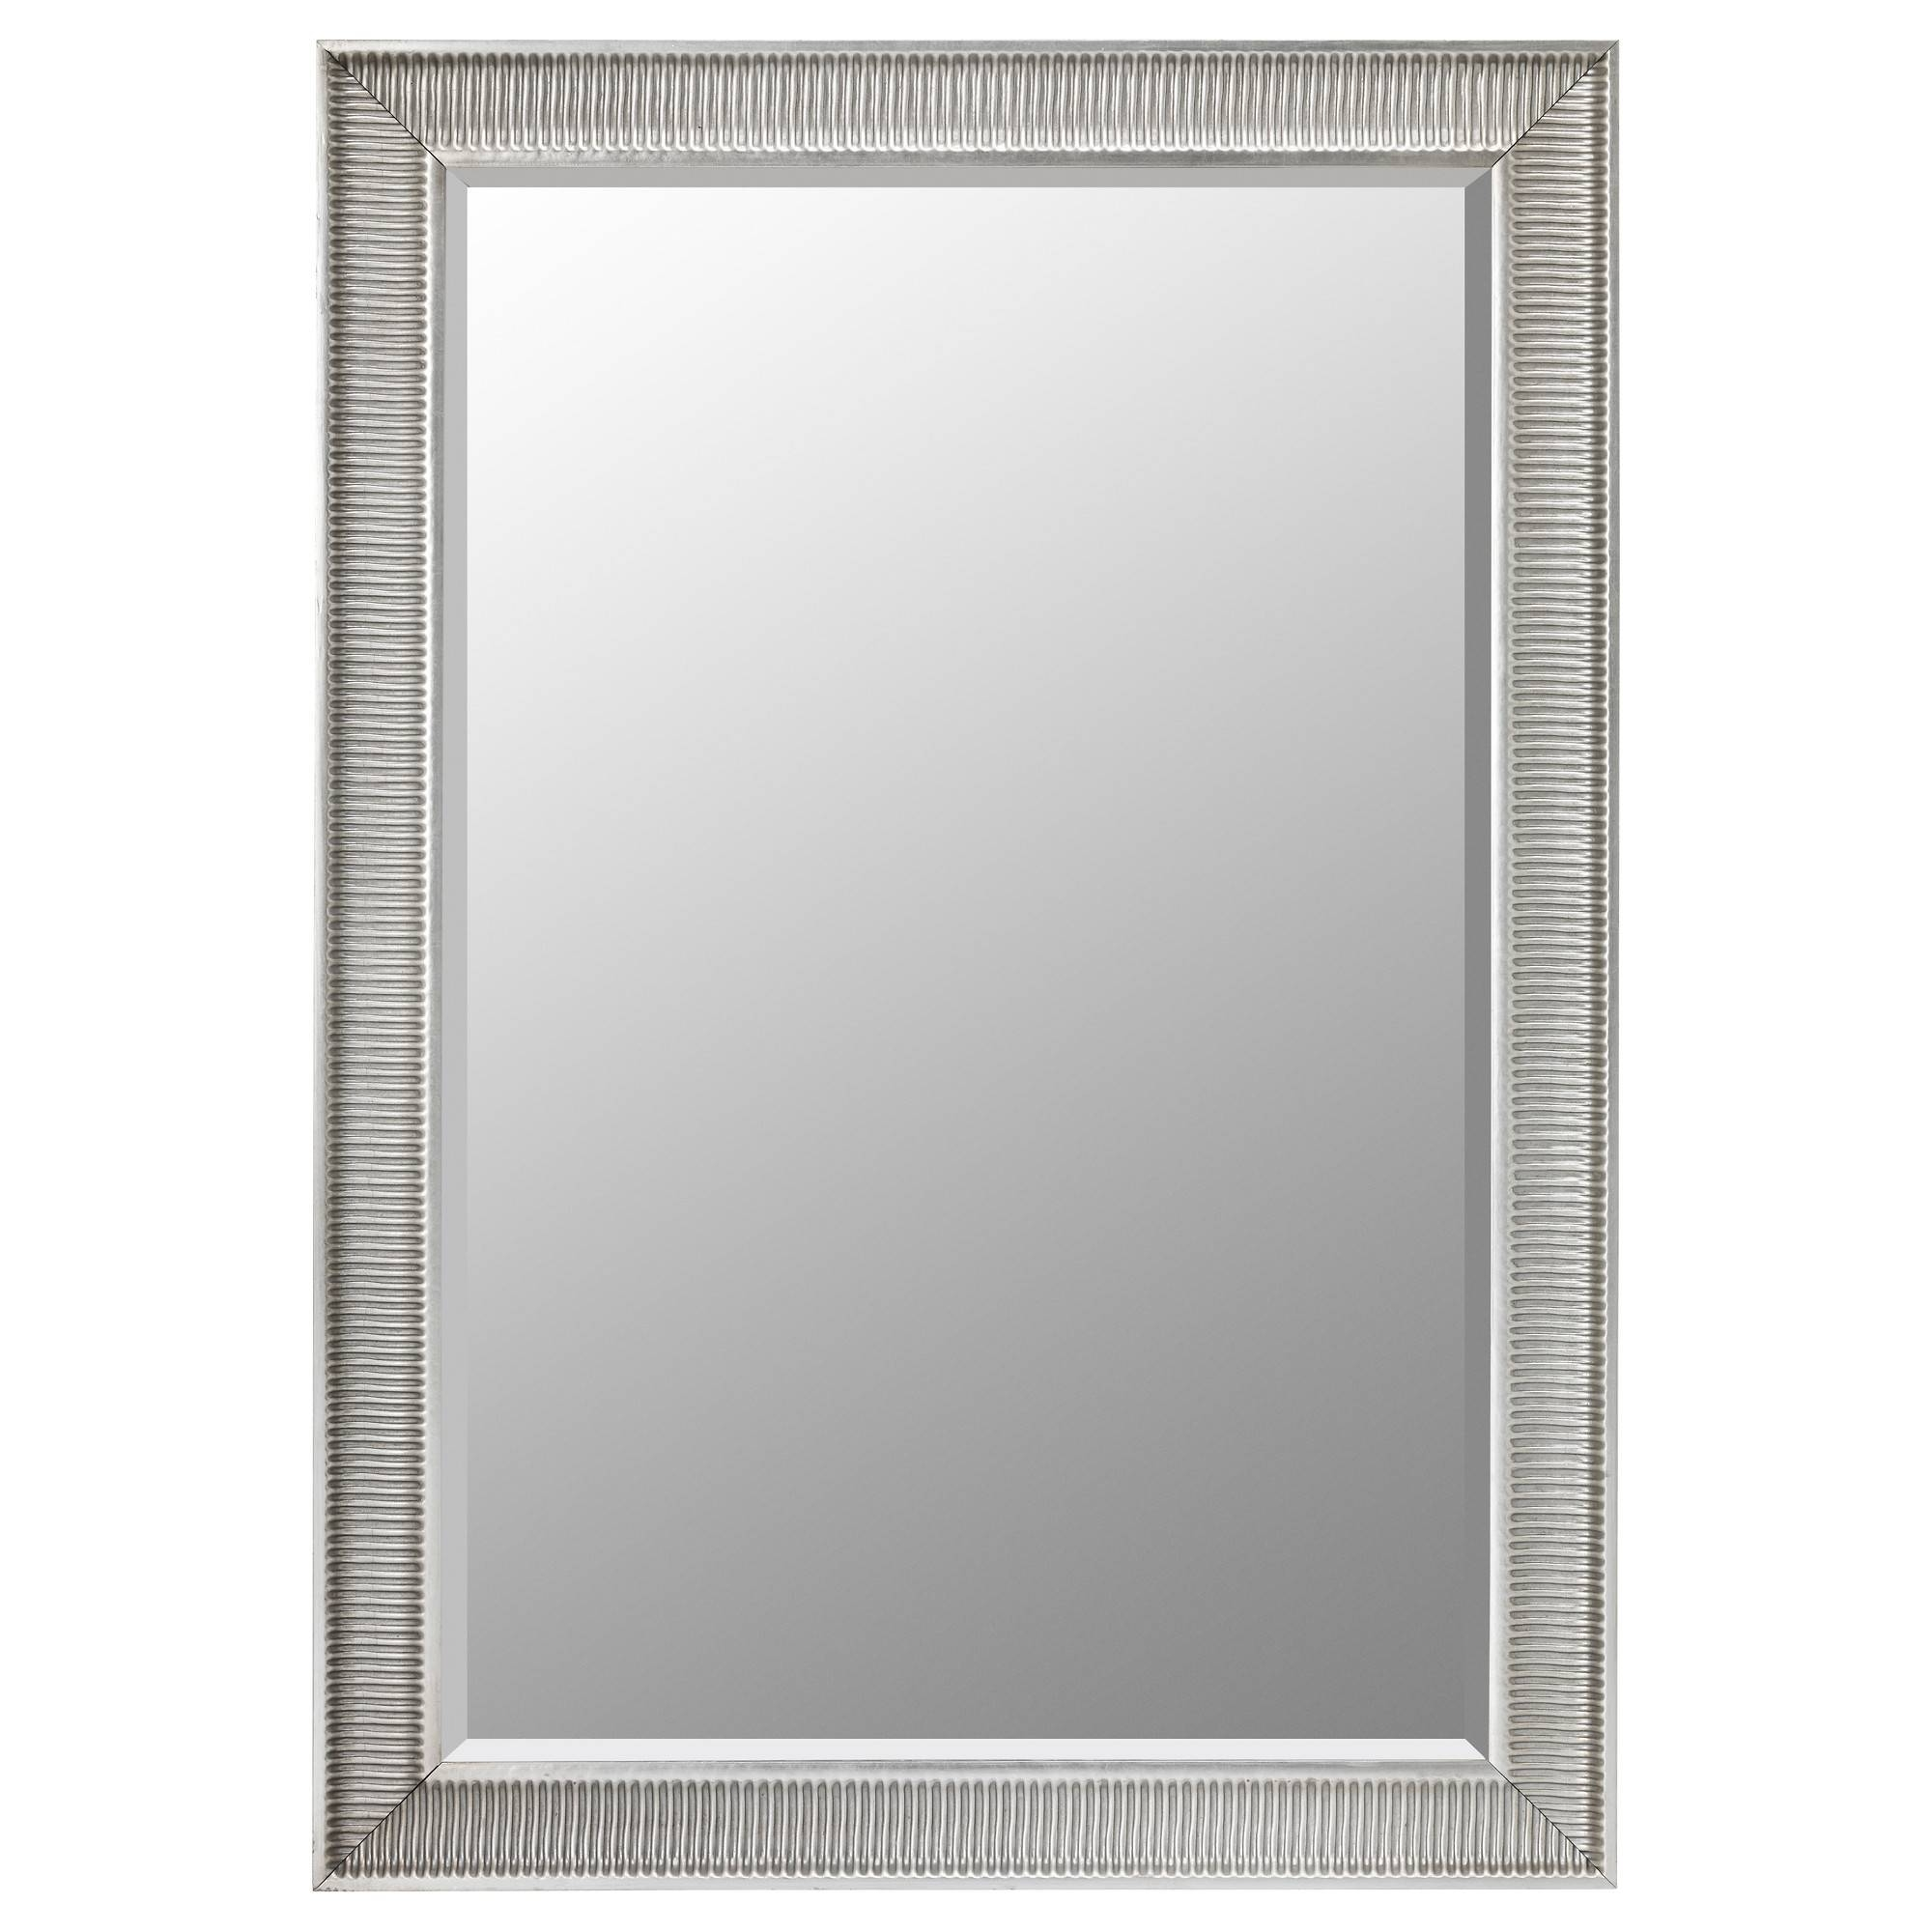 Songe Mirror – Ikea Inside Rectangular Silver Mirrors (View 13 of 15)